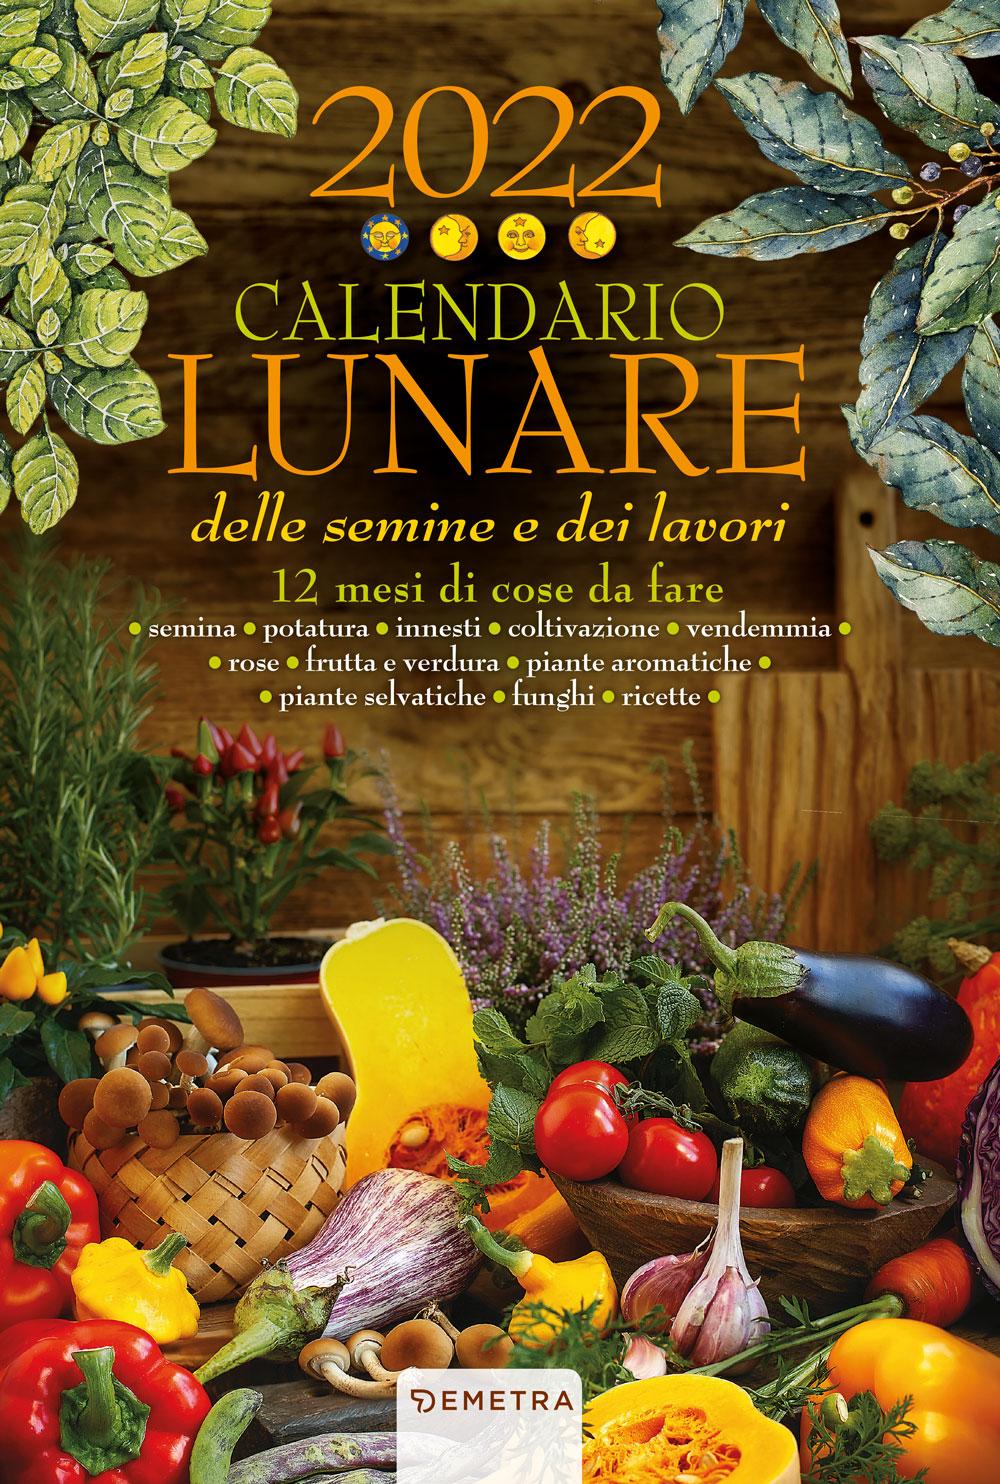 Calendario lunare 2022